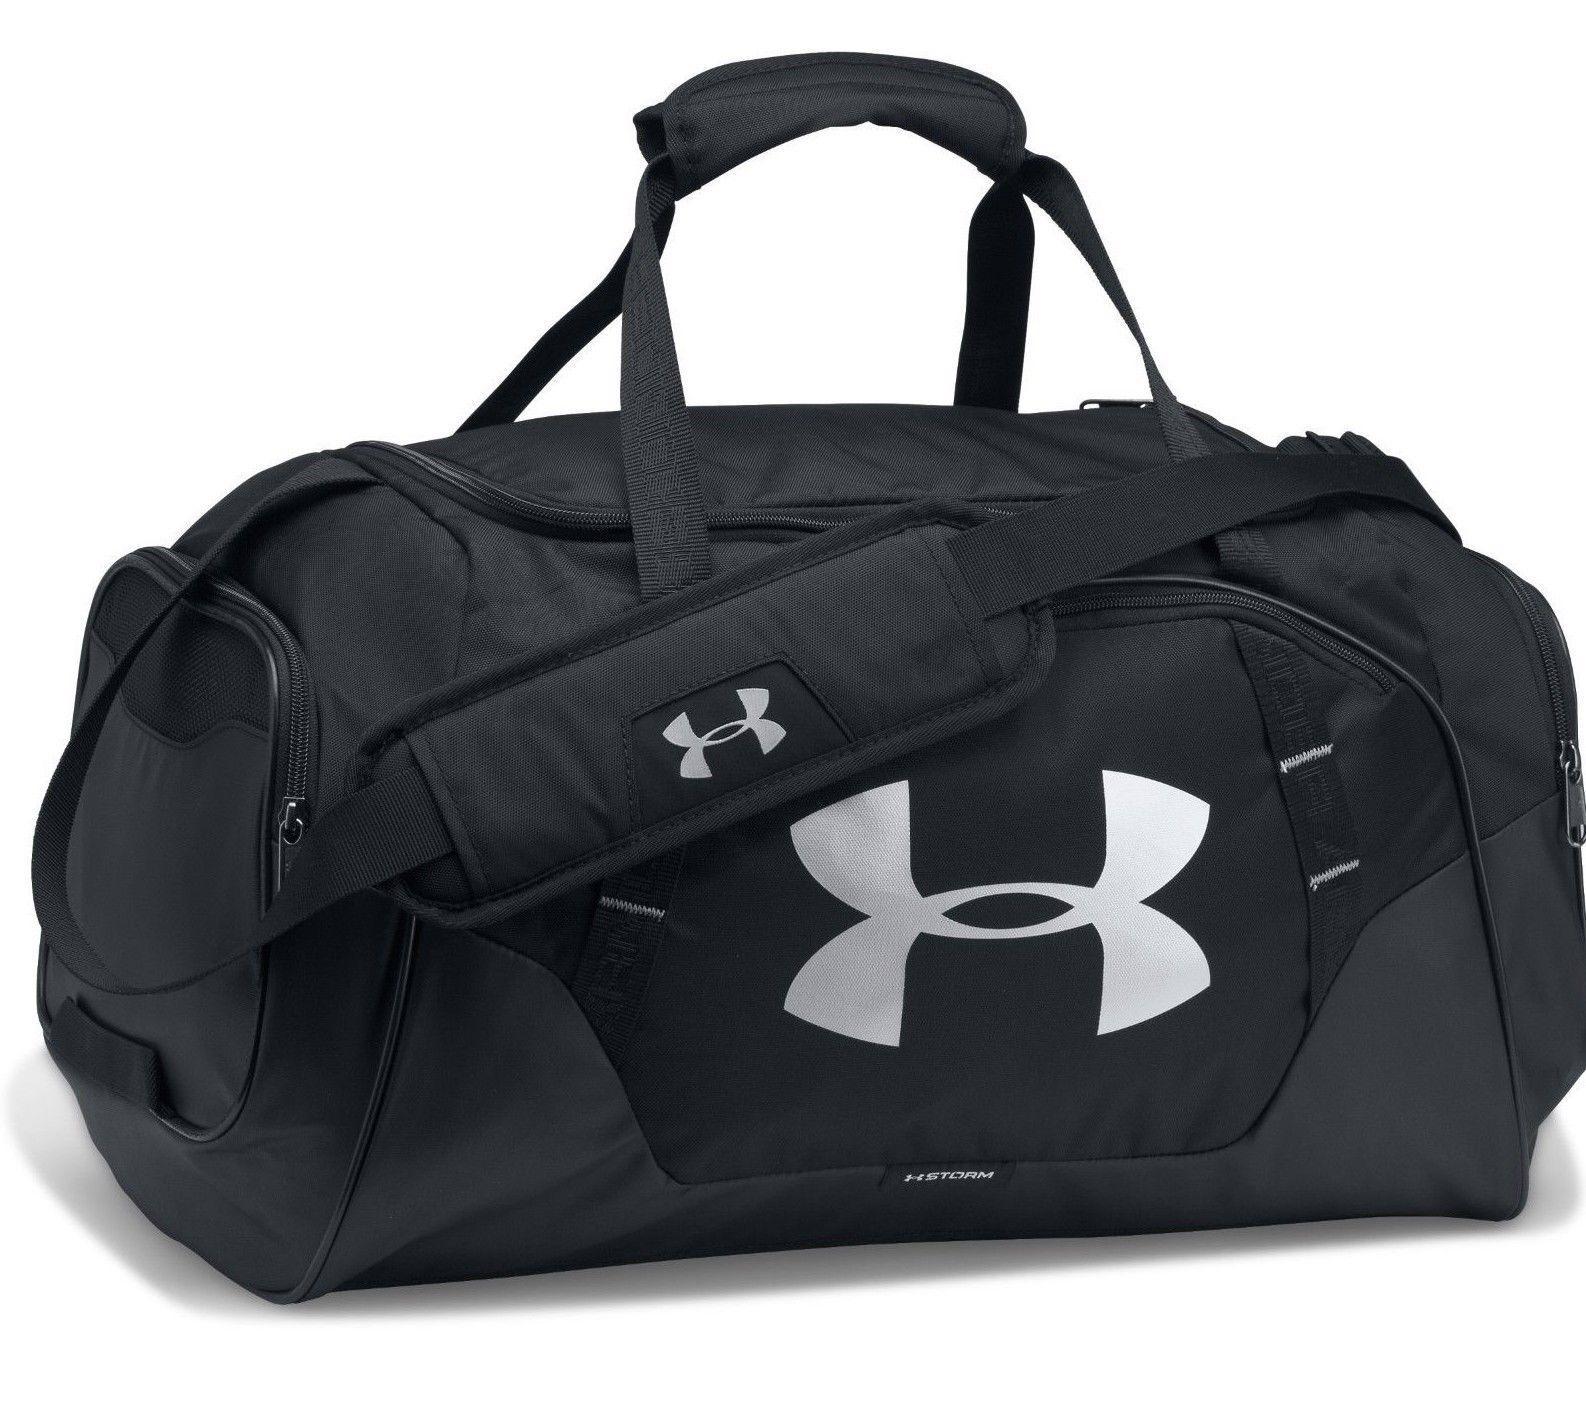 Under Armour Black Undeniable 3.0 LG Duffle Bag For Men - 1300216-001 86e62da68b155